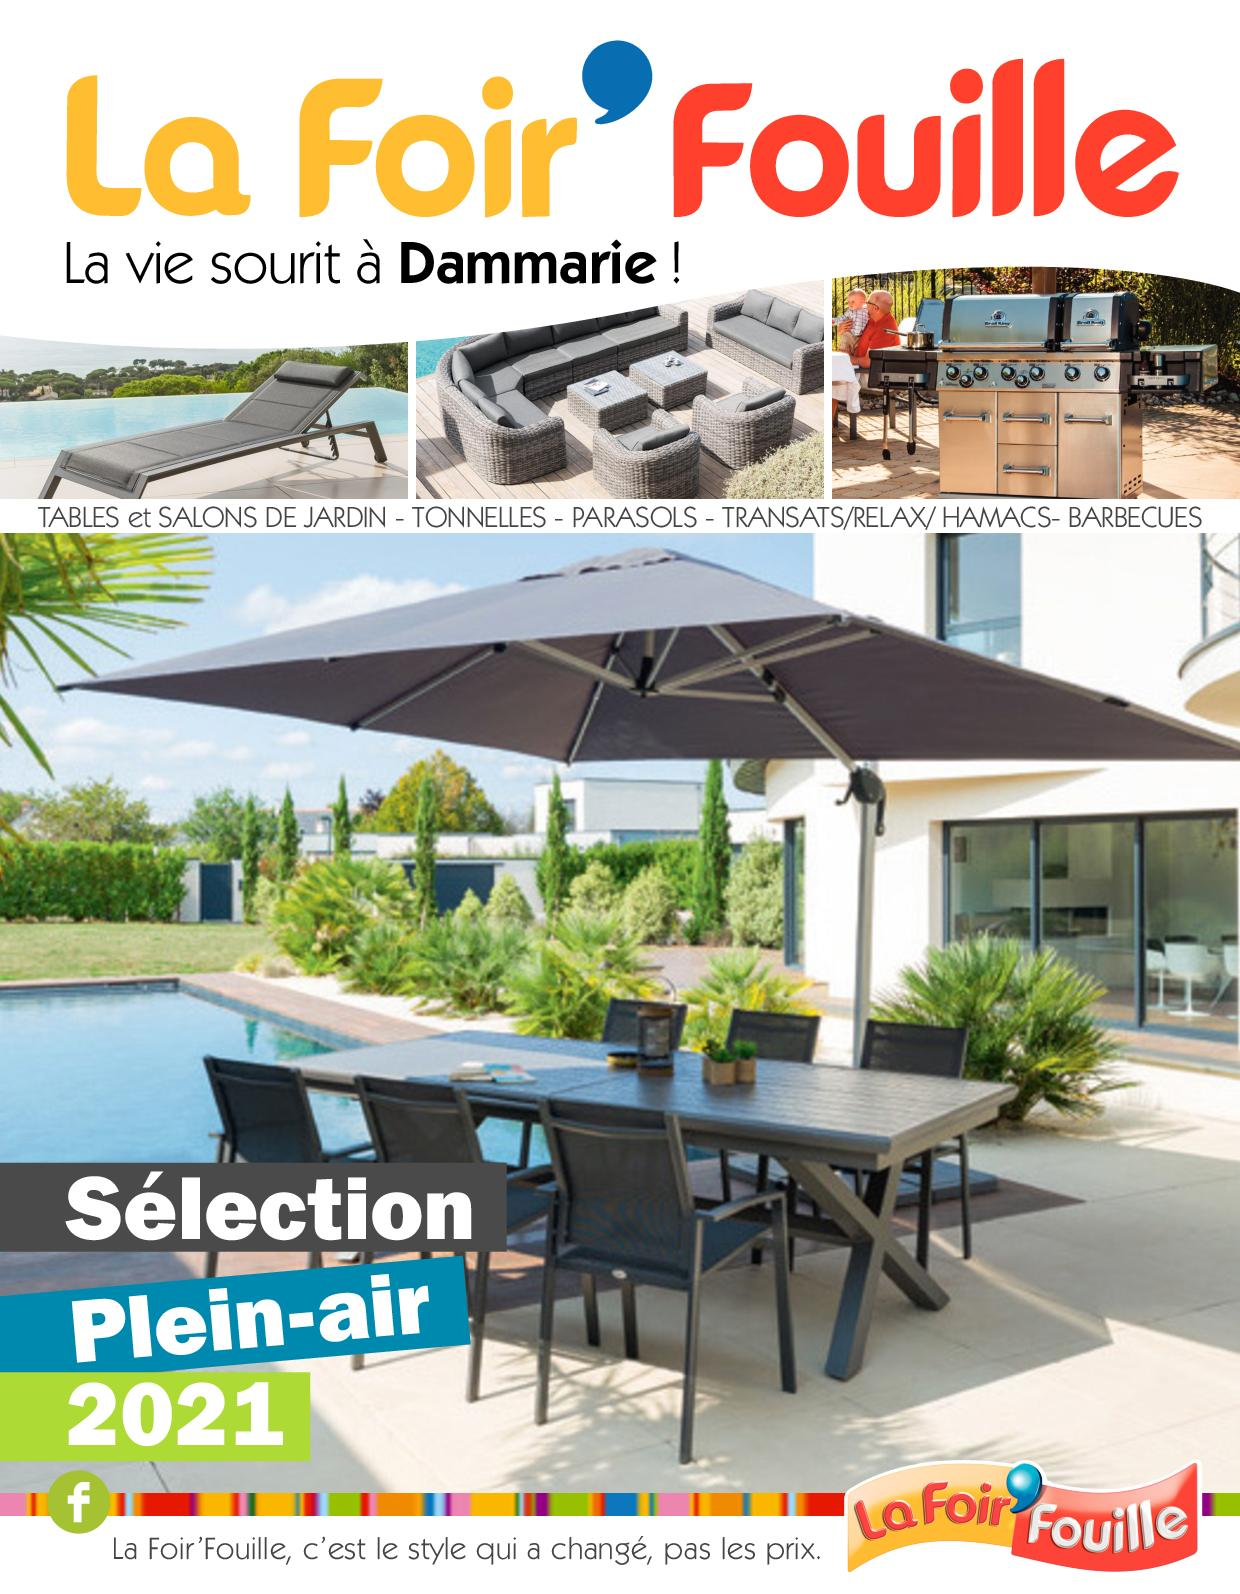 Calameo La Foir Fouille Dammarie Les Lys Selection Plein Air 2021 Hesperide